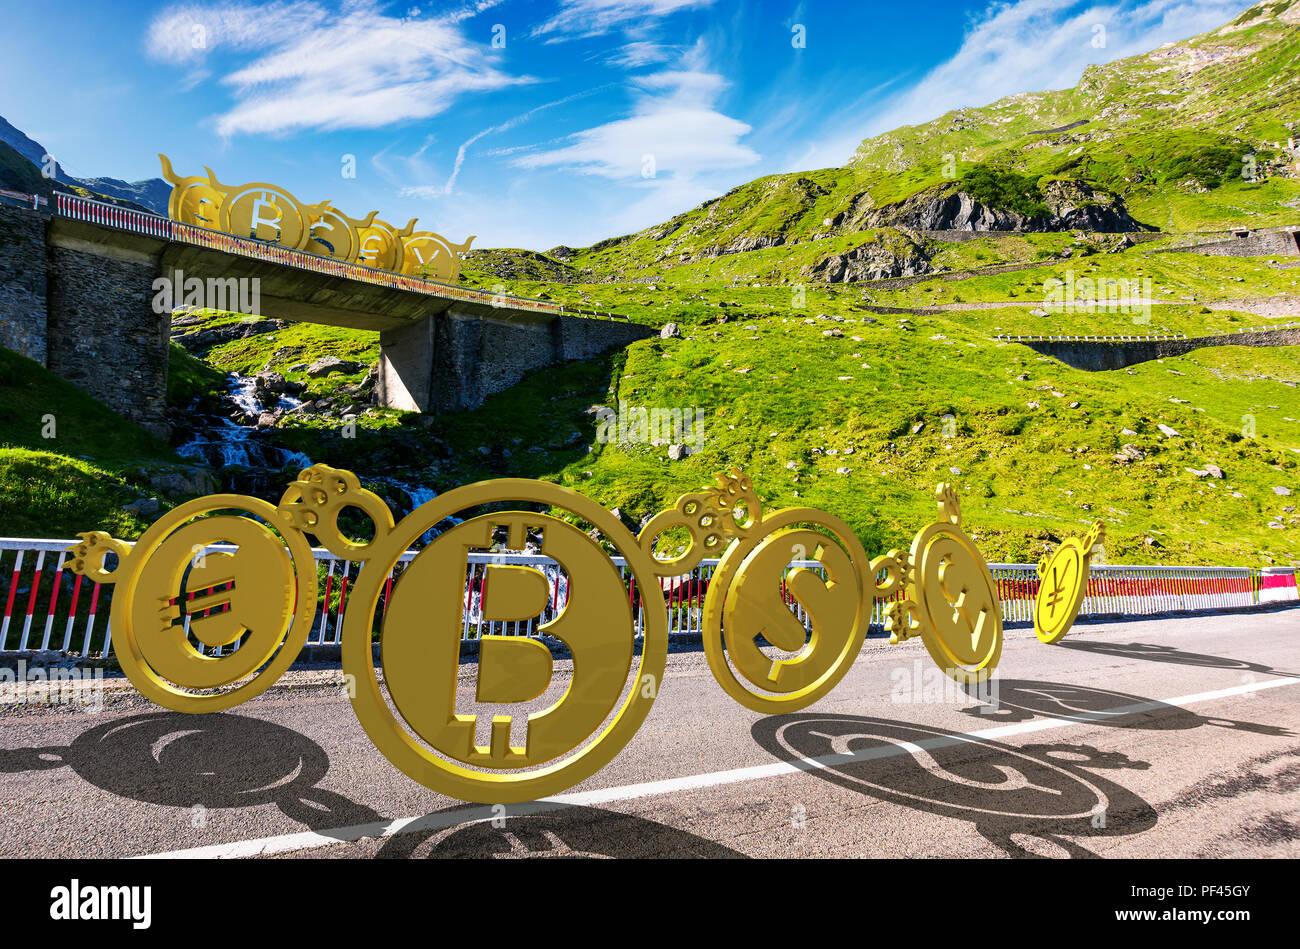 bullish or bearish marketing trend. bears down the road make fun of bulls up on the bridge. currency market trading concept Stock Photo